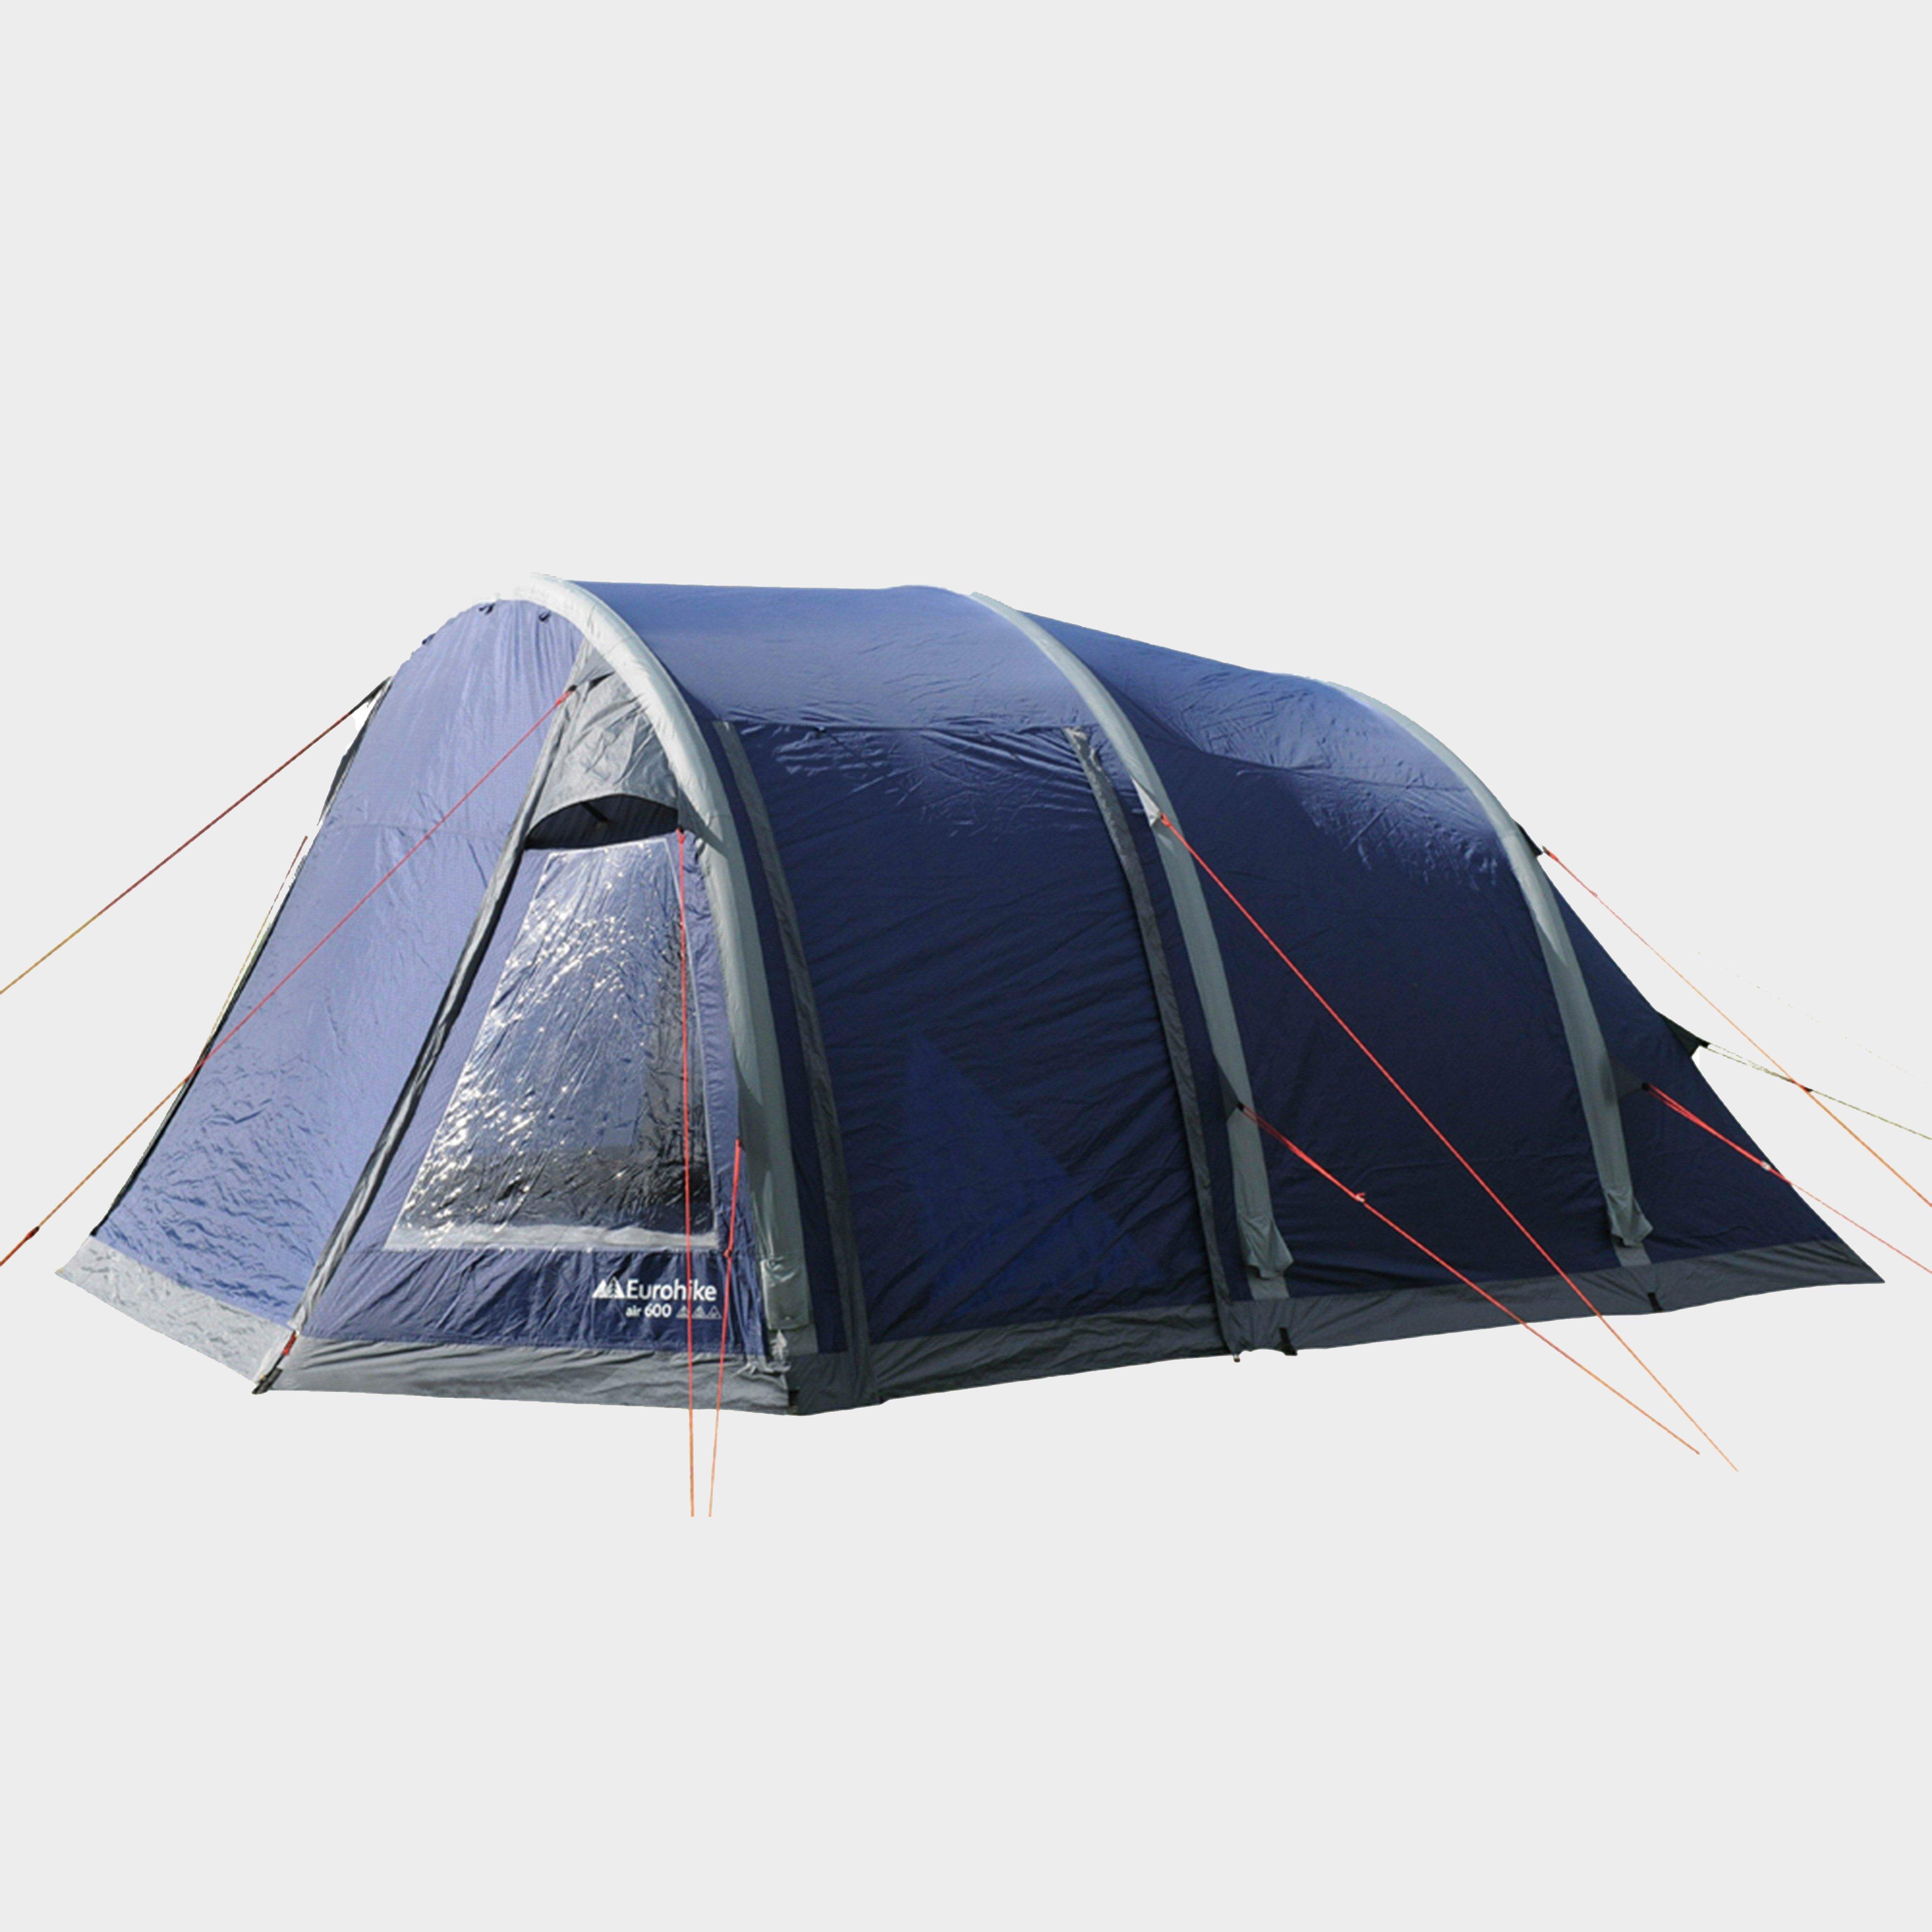 Eurohike Air 600 Inflatable Tent